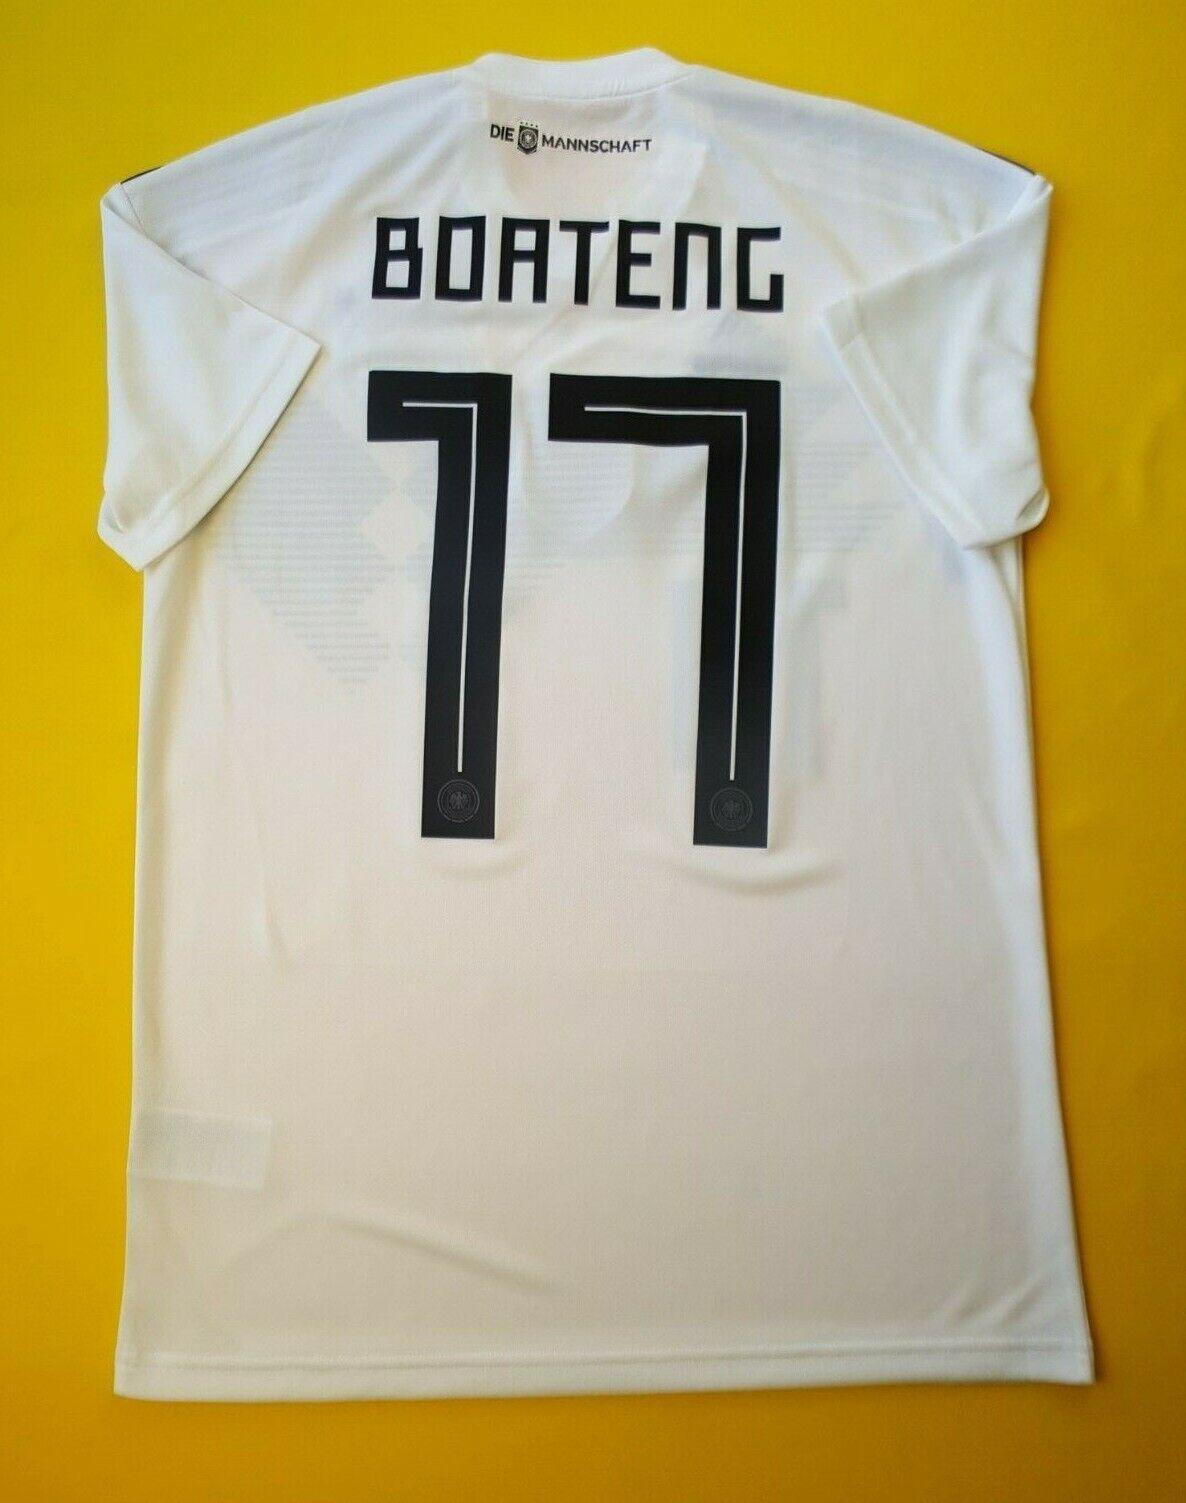 7e2ba9df151 Boateng Germany soccer jersey small 2019 home shirt BR7843 Adidas ig93 5 5